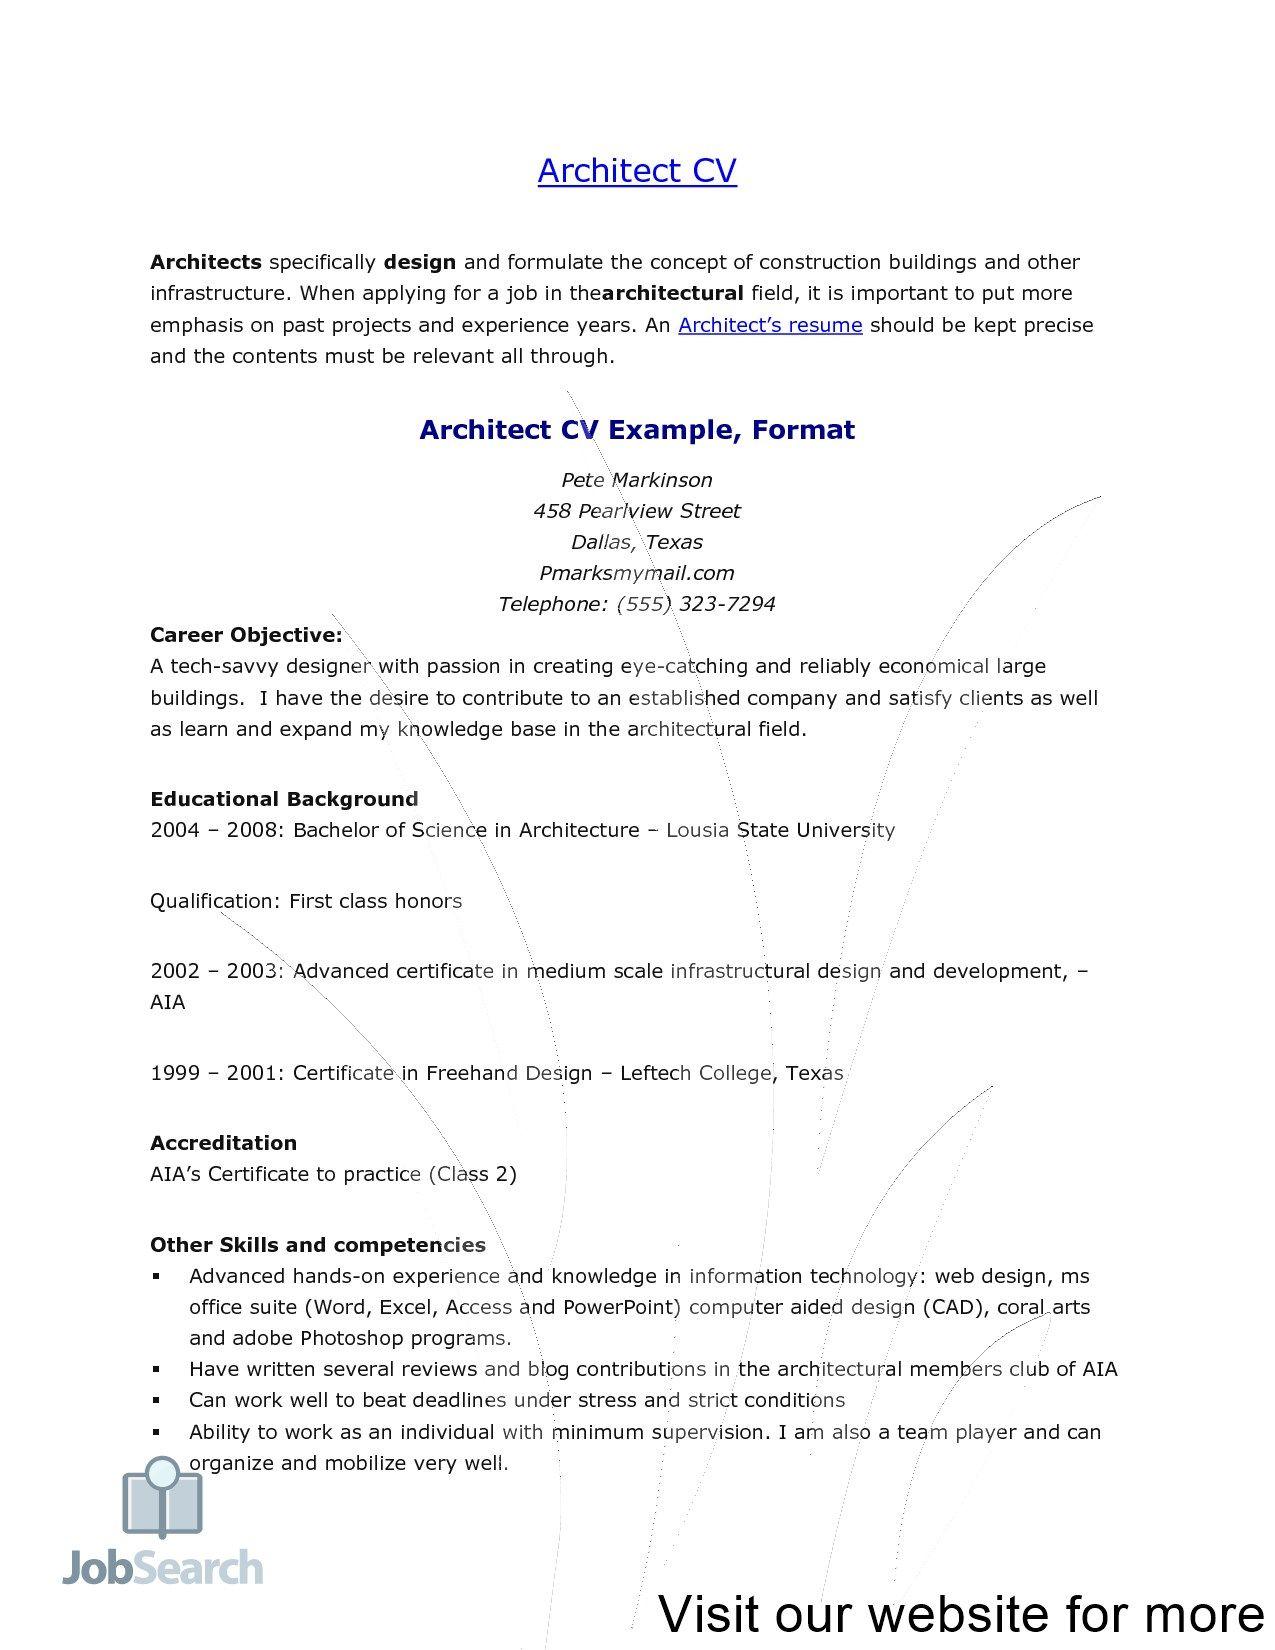 resume example australia 2019 in 2020 Resume examples